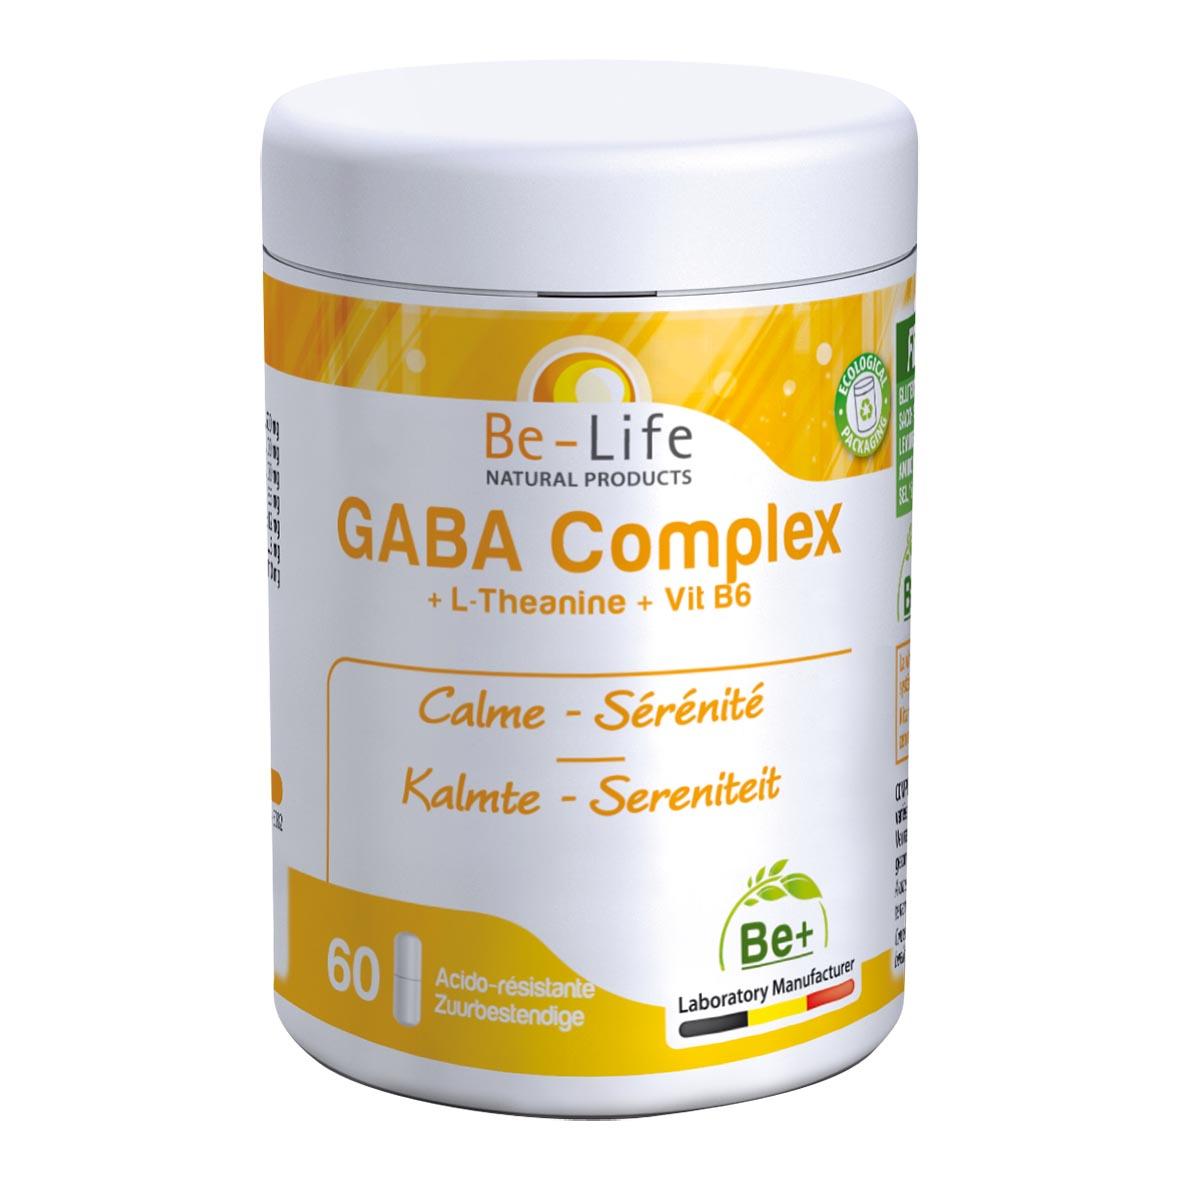 Gaba Complexe 60 gélules